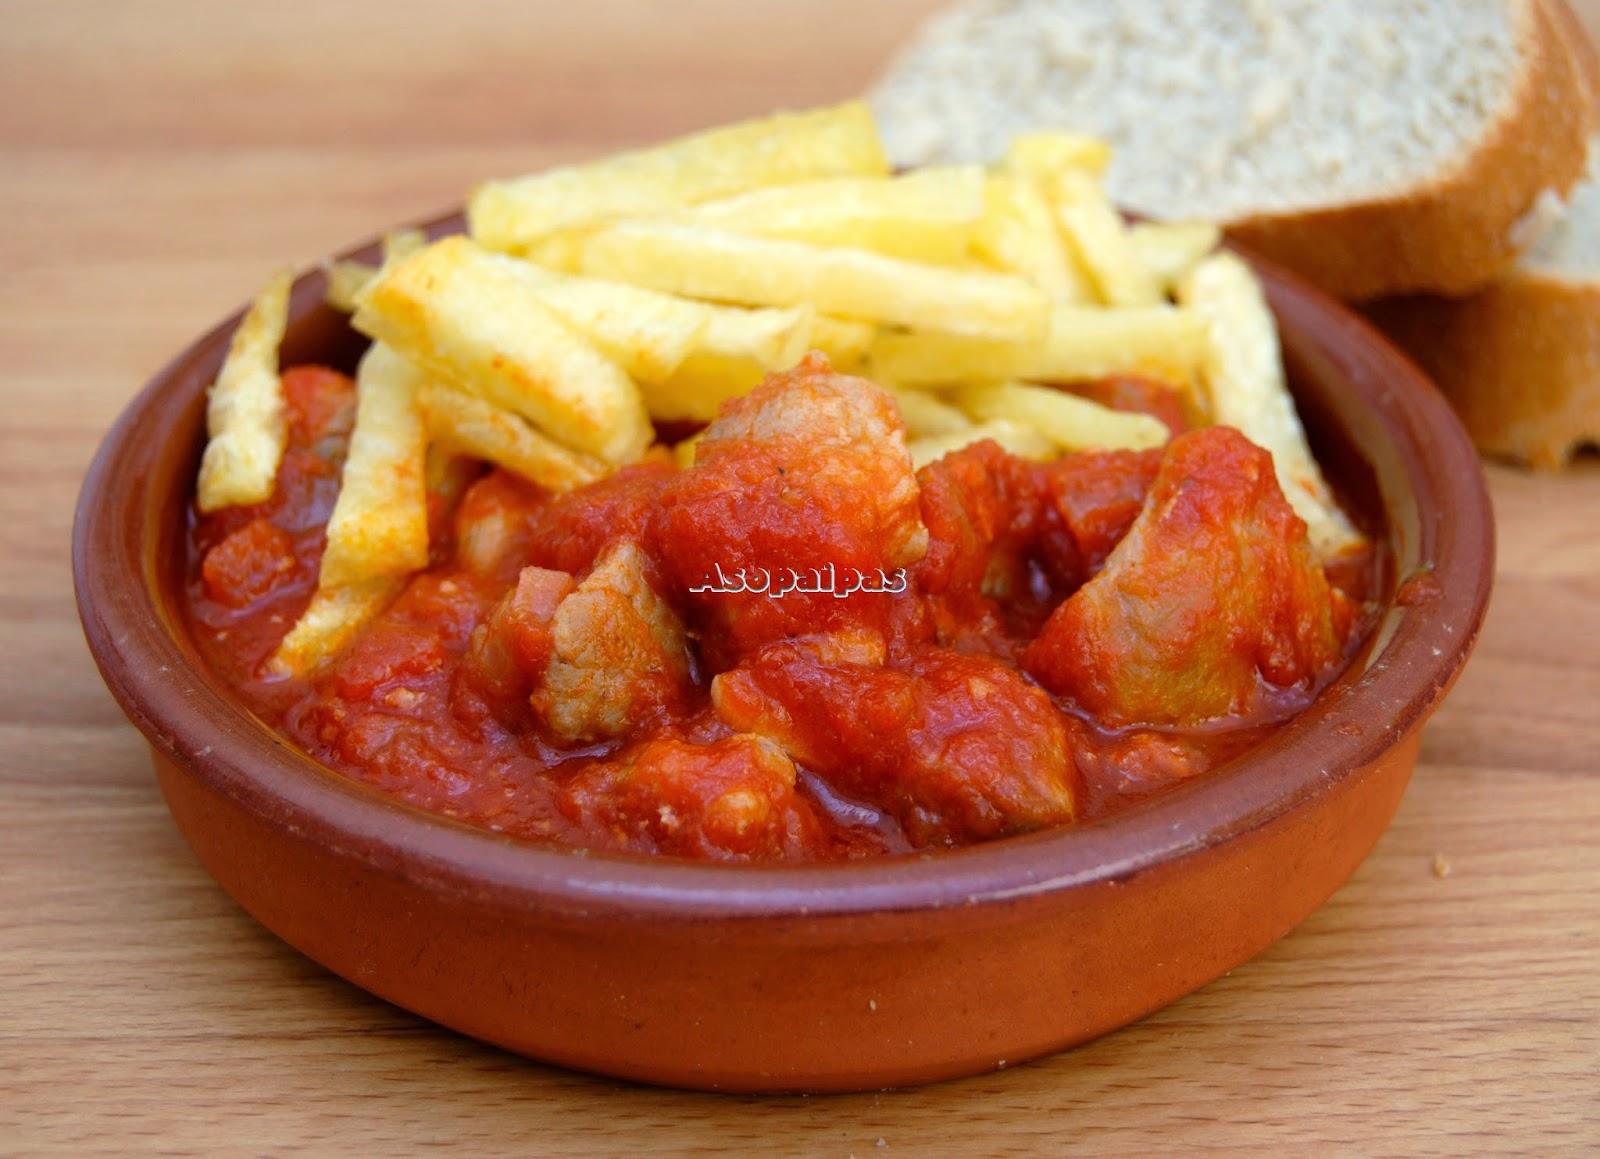 Patatas con tomate, receta típica de Estepa